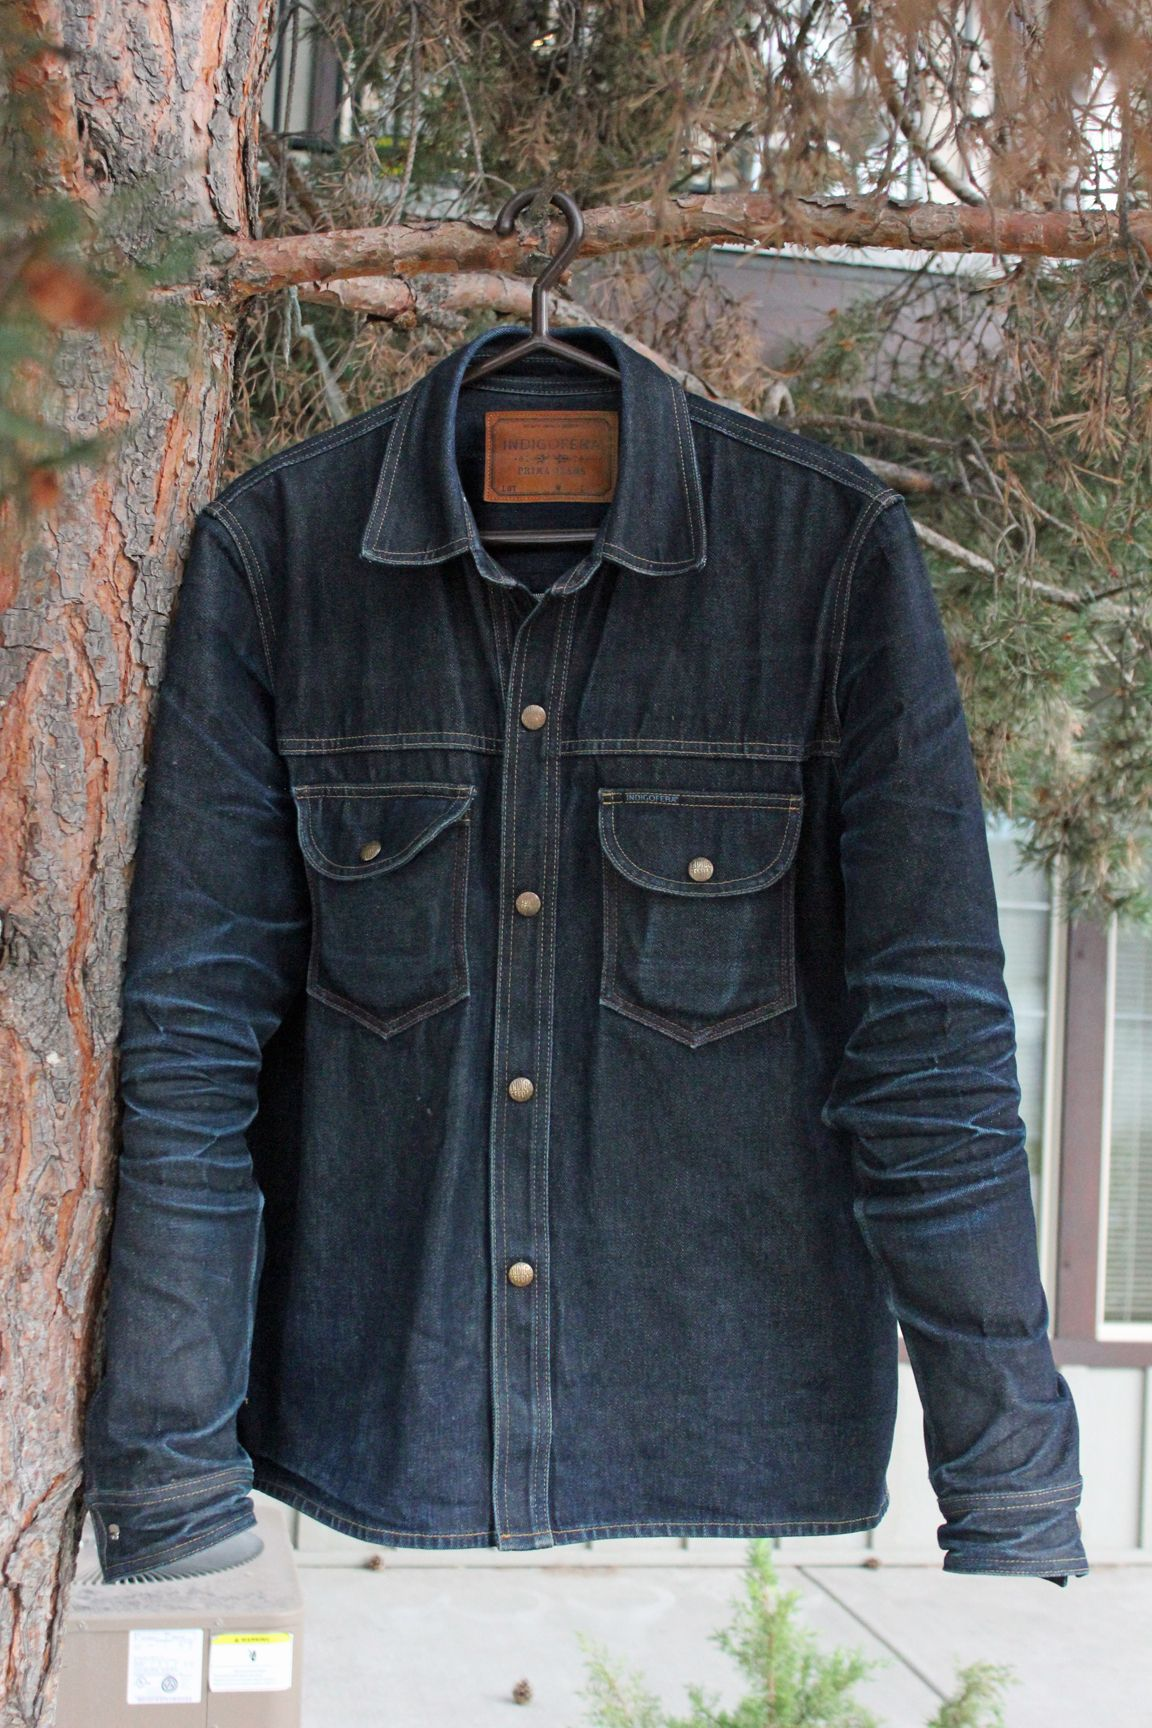 6f5c879b3e Heavyweight denim shirt - Indigofera 14 oz